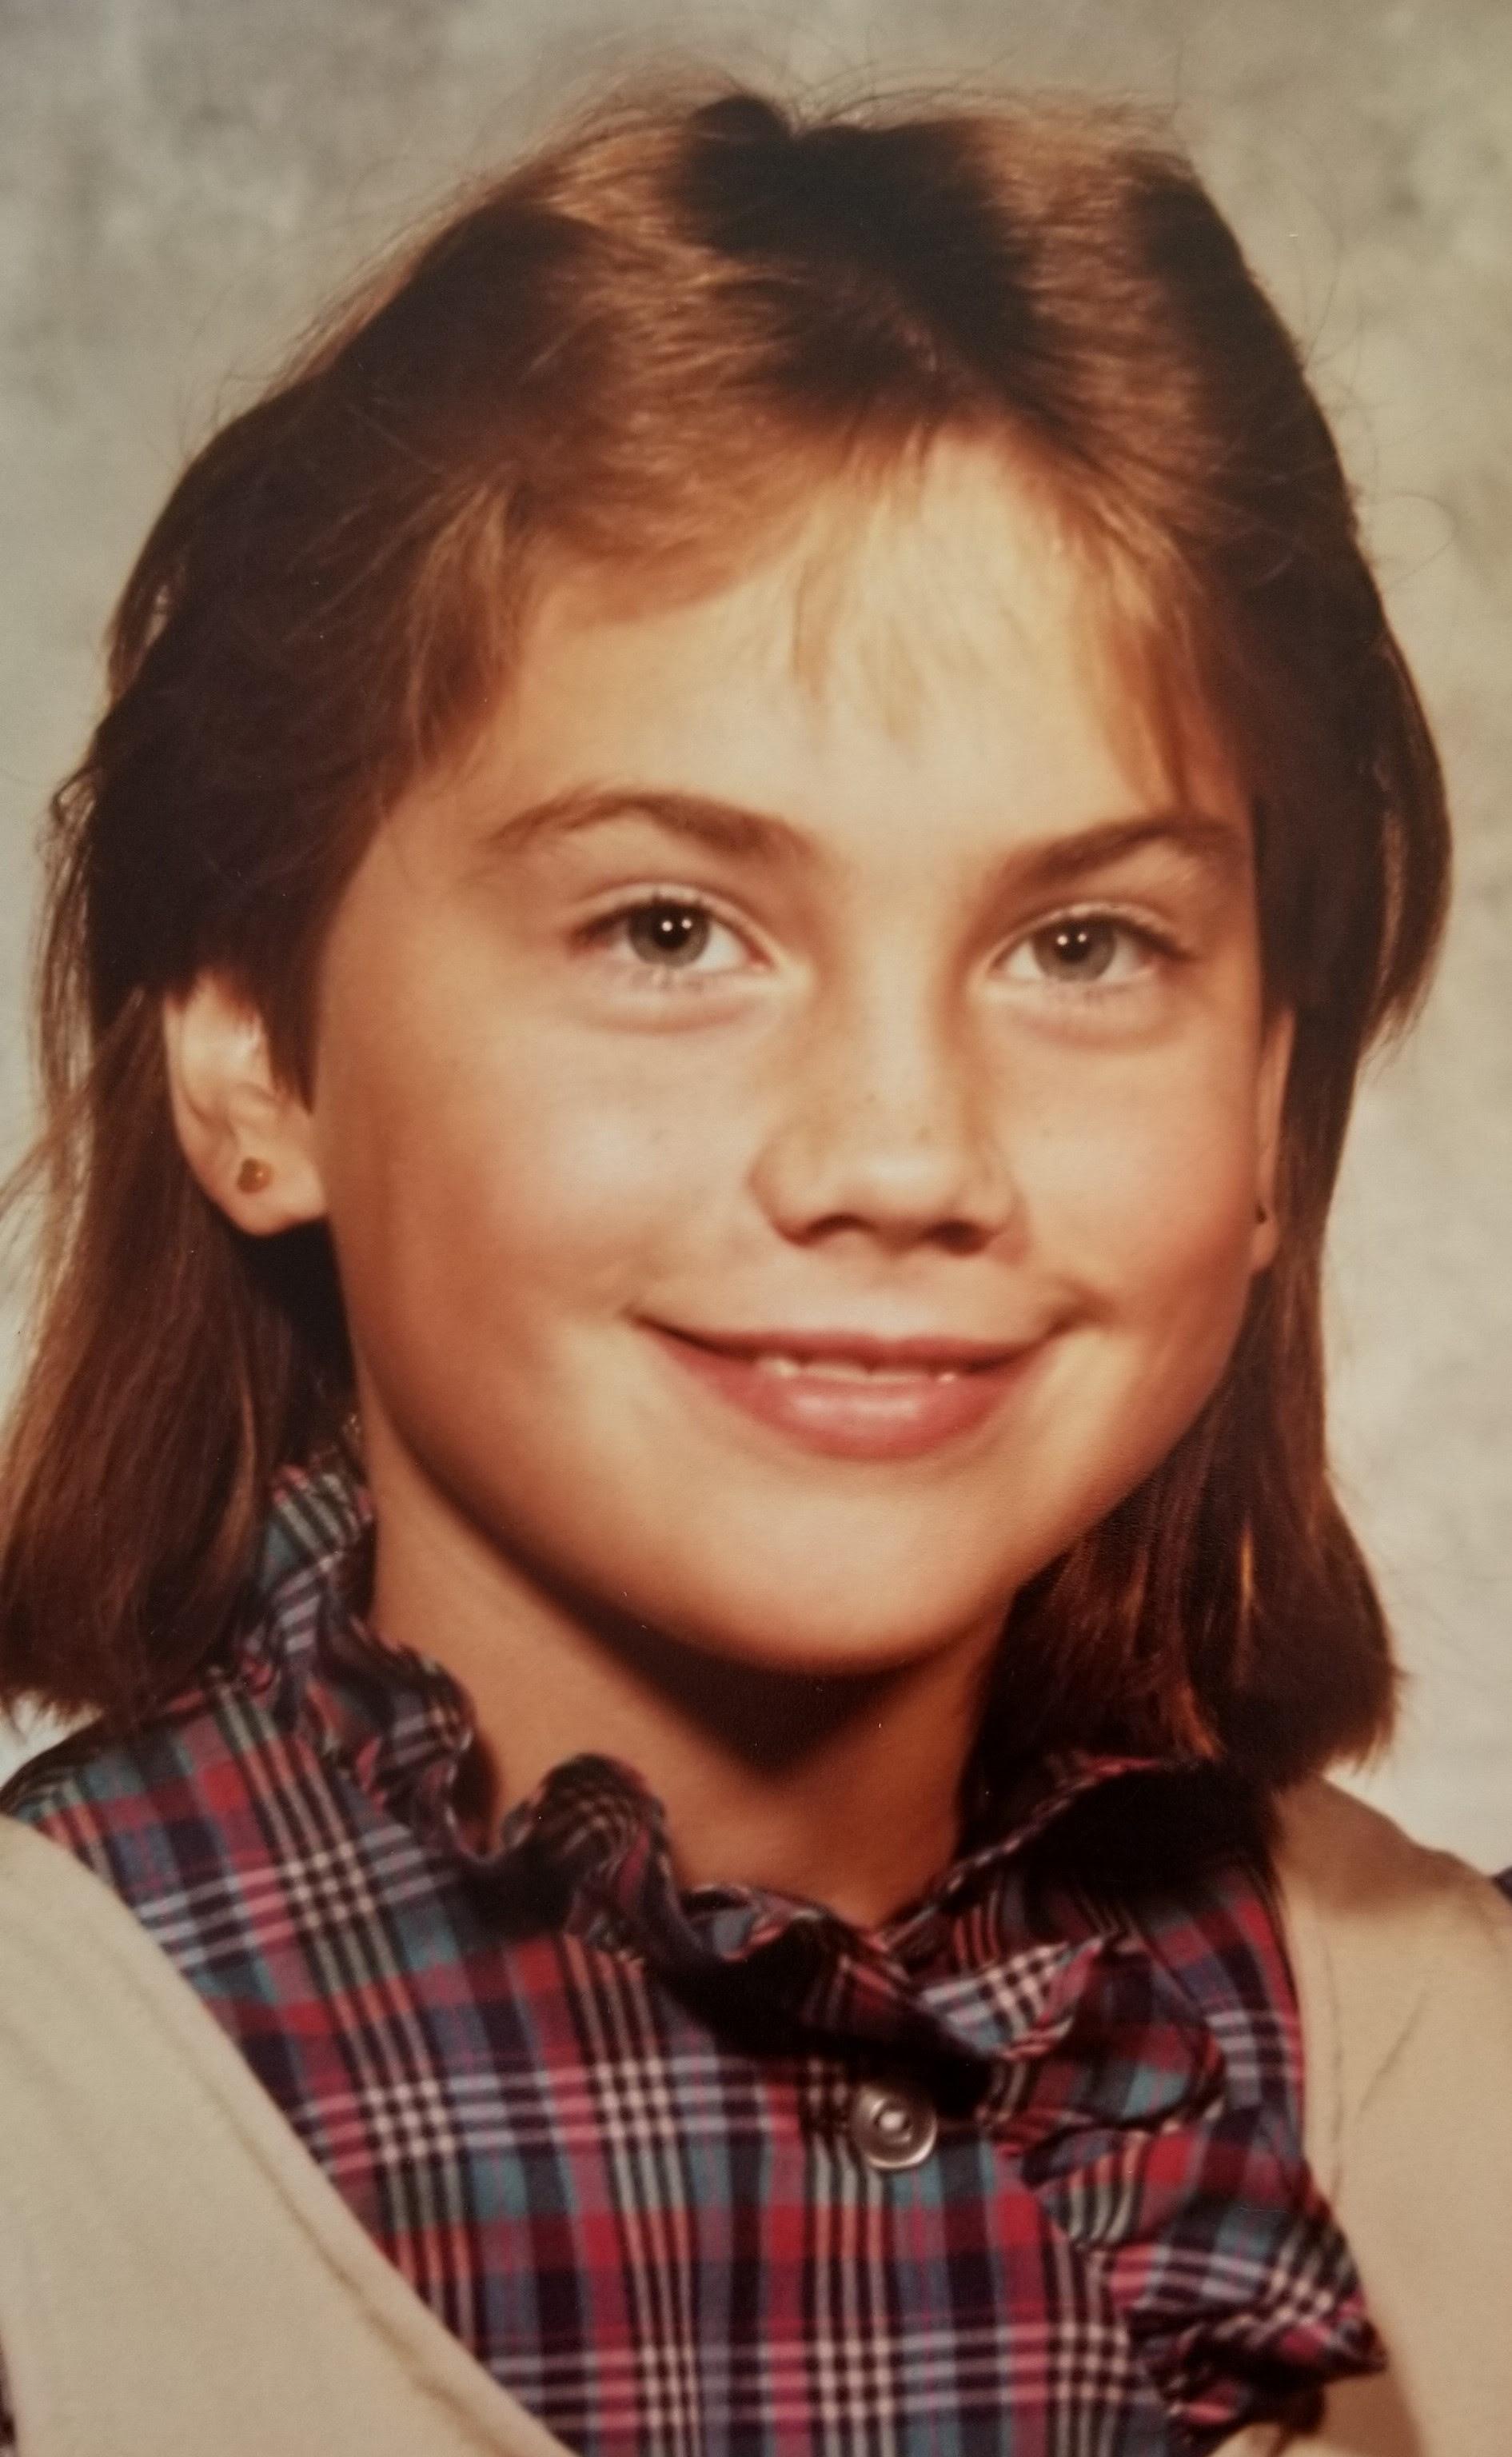 Lorri age 10